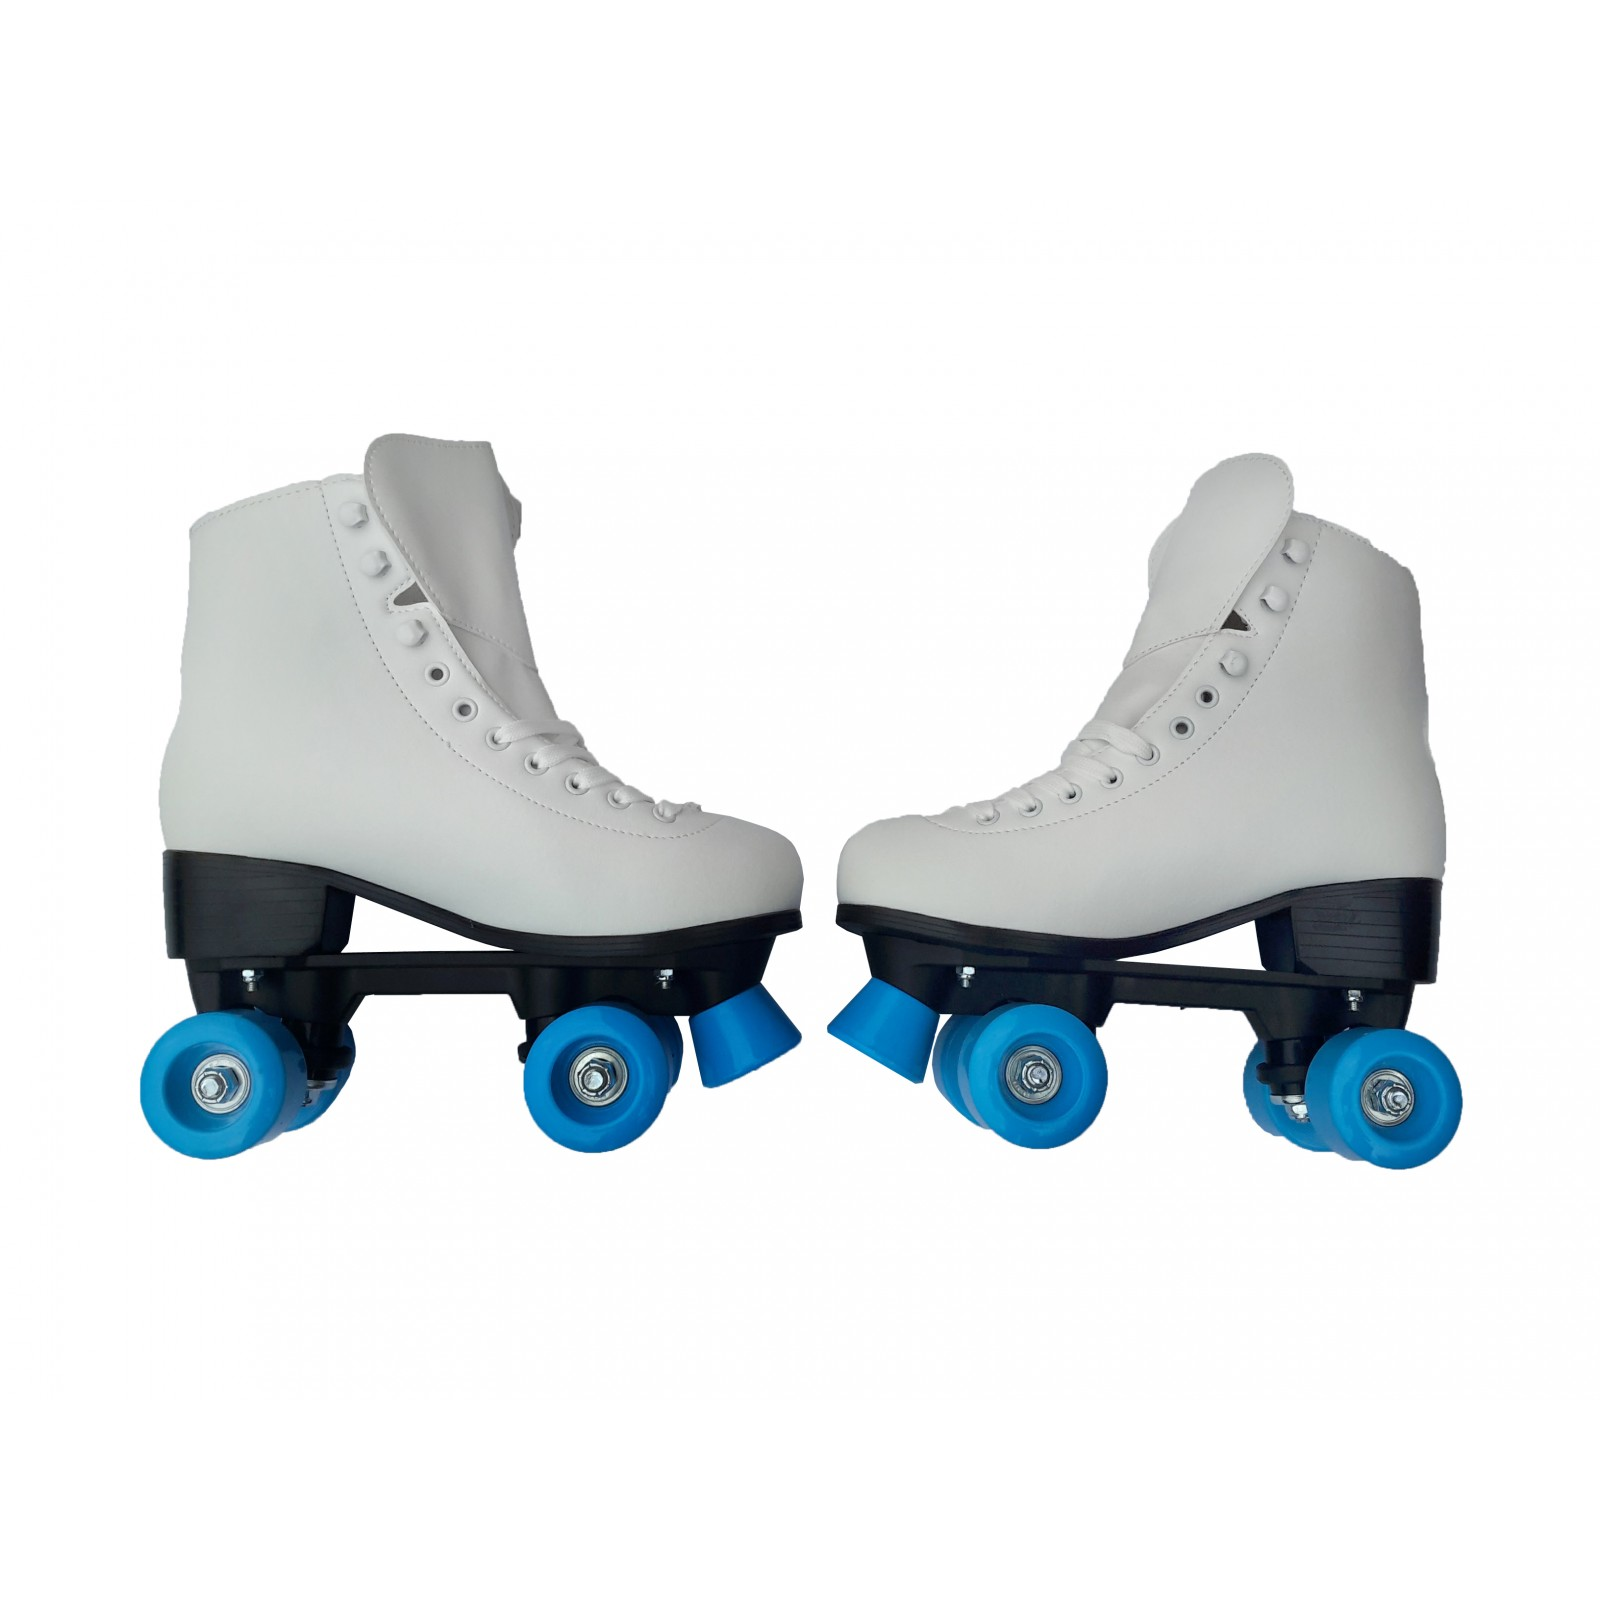 Patines Patin 4 Ruedas Llantas Blancos Roller Skate Artistic ...